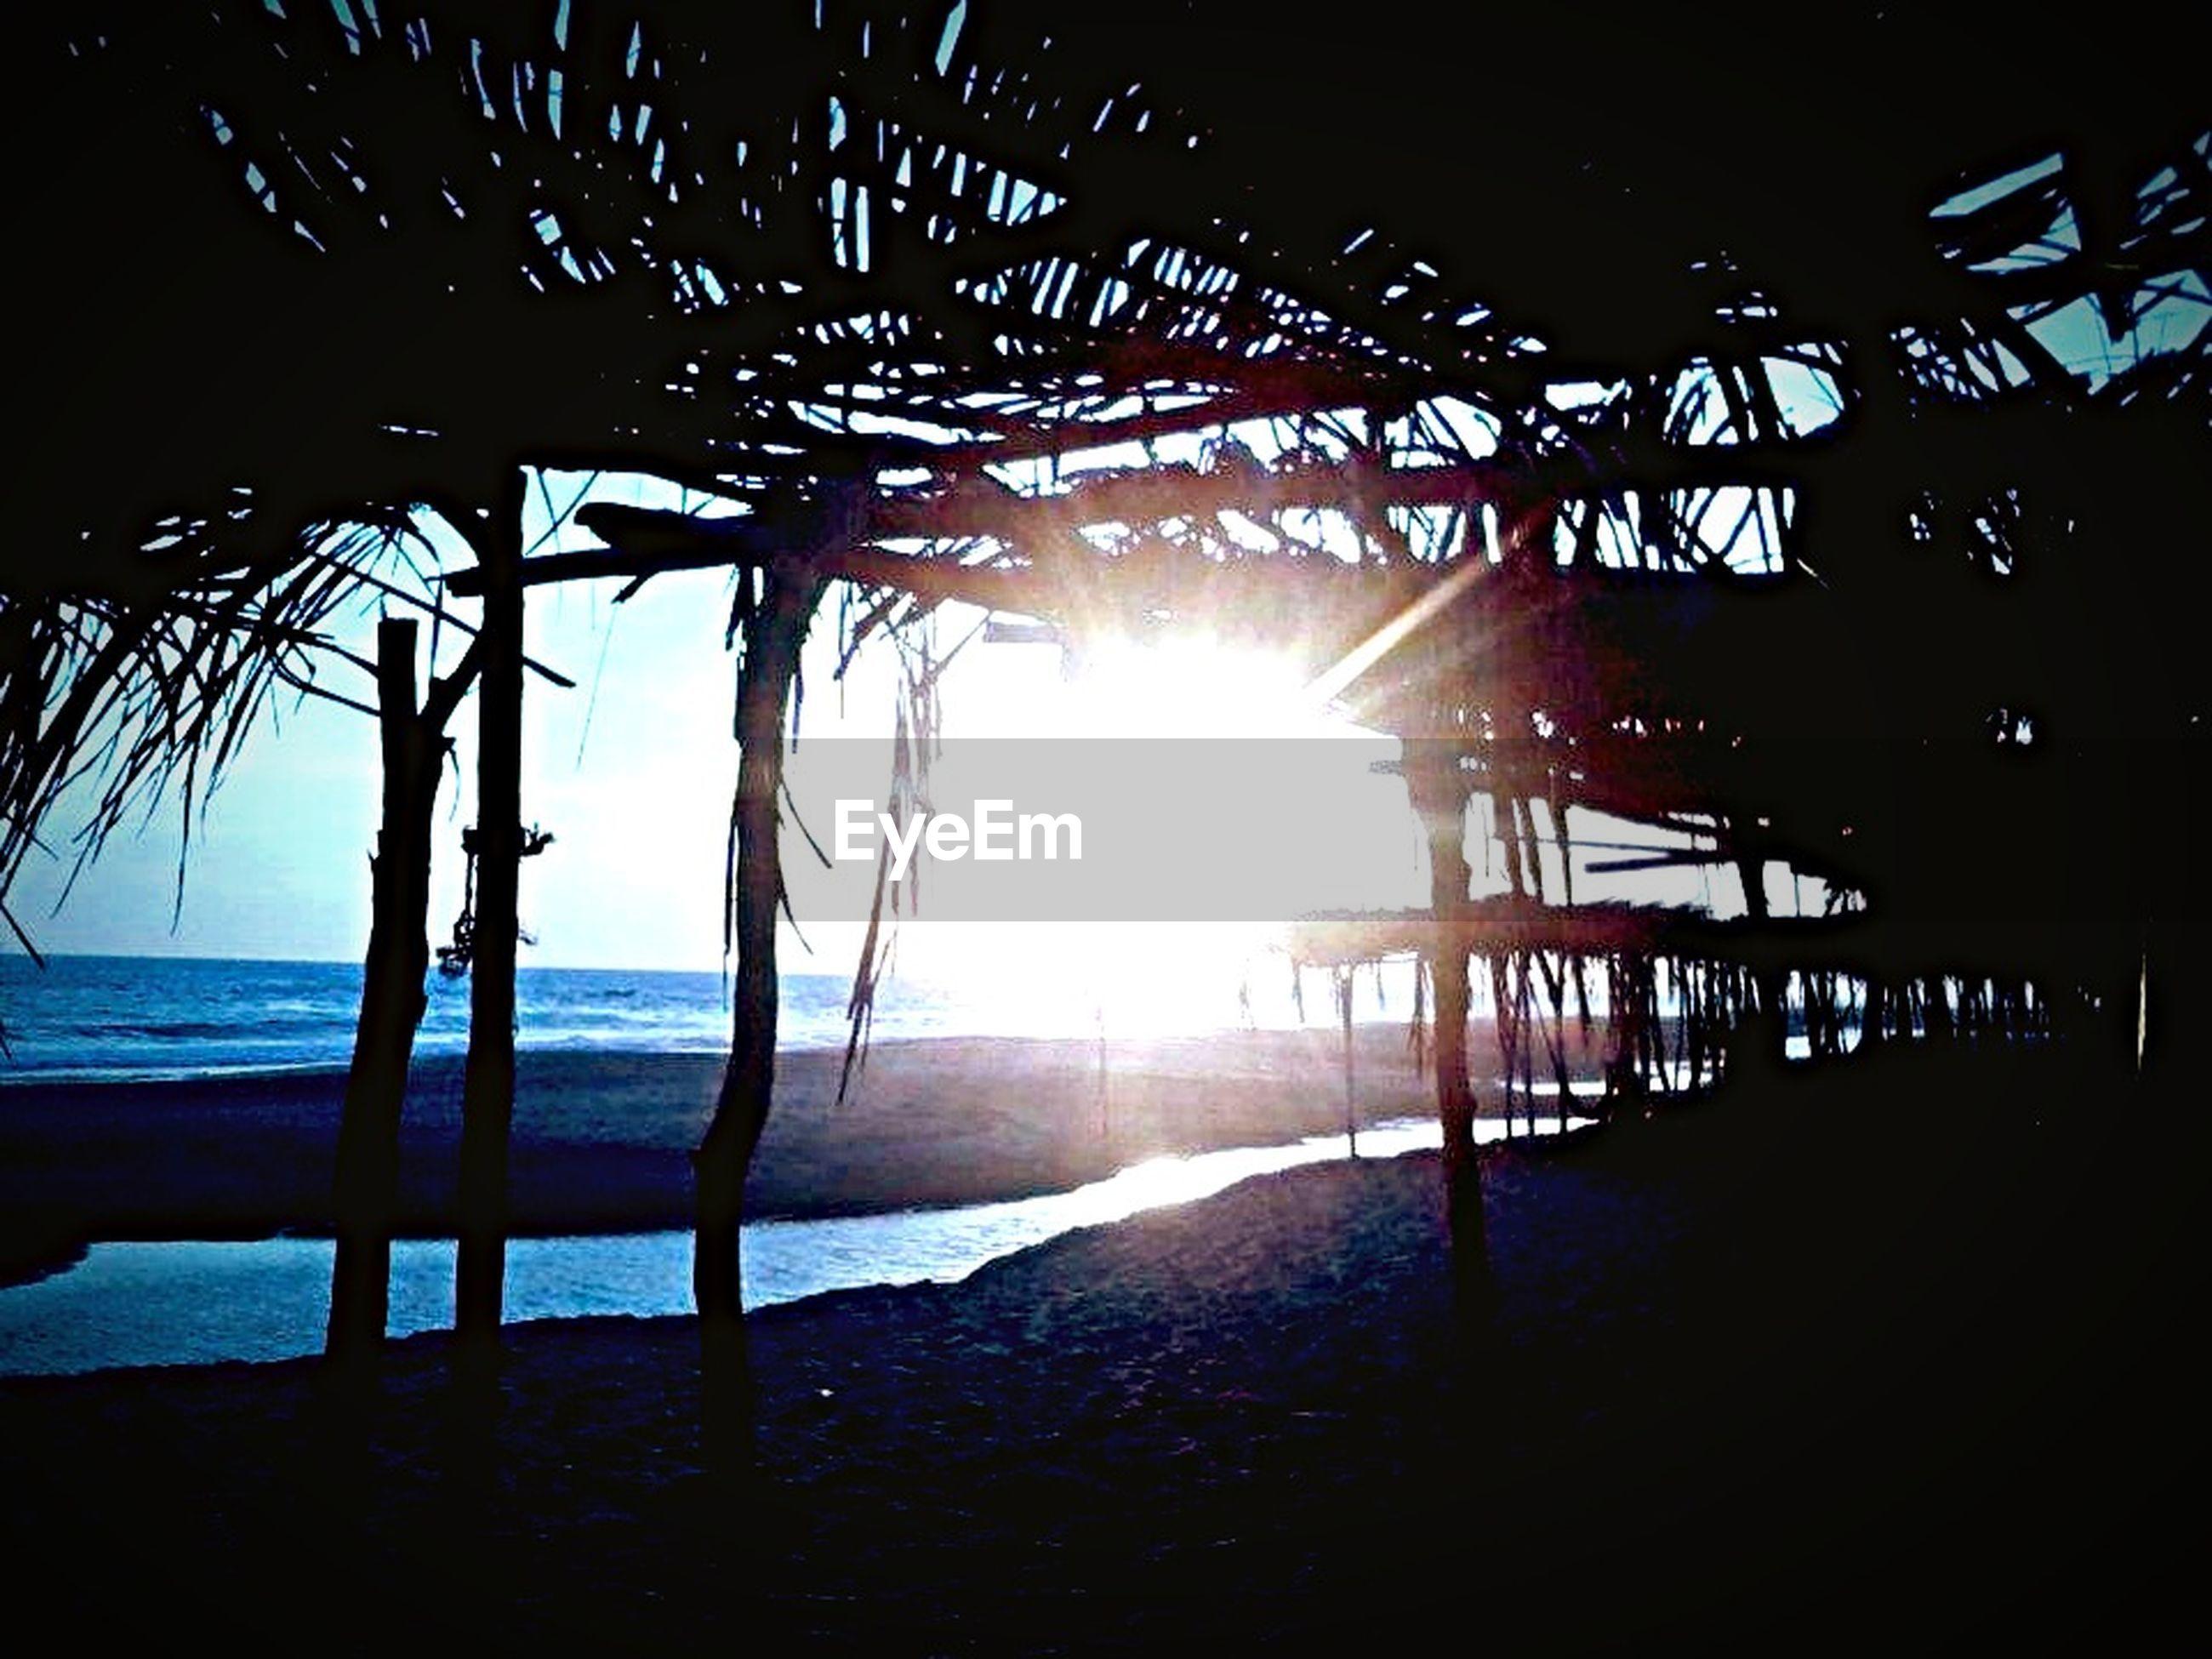 sea, water, sun, beach, horizon over water, shore, sunset, sunbeam, sunlight, scenics, sky, tranquility, beauty in nature, nature, wave, tranquil scene, sand, lens flare, silhouette, pier